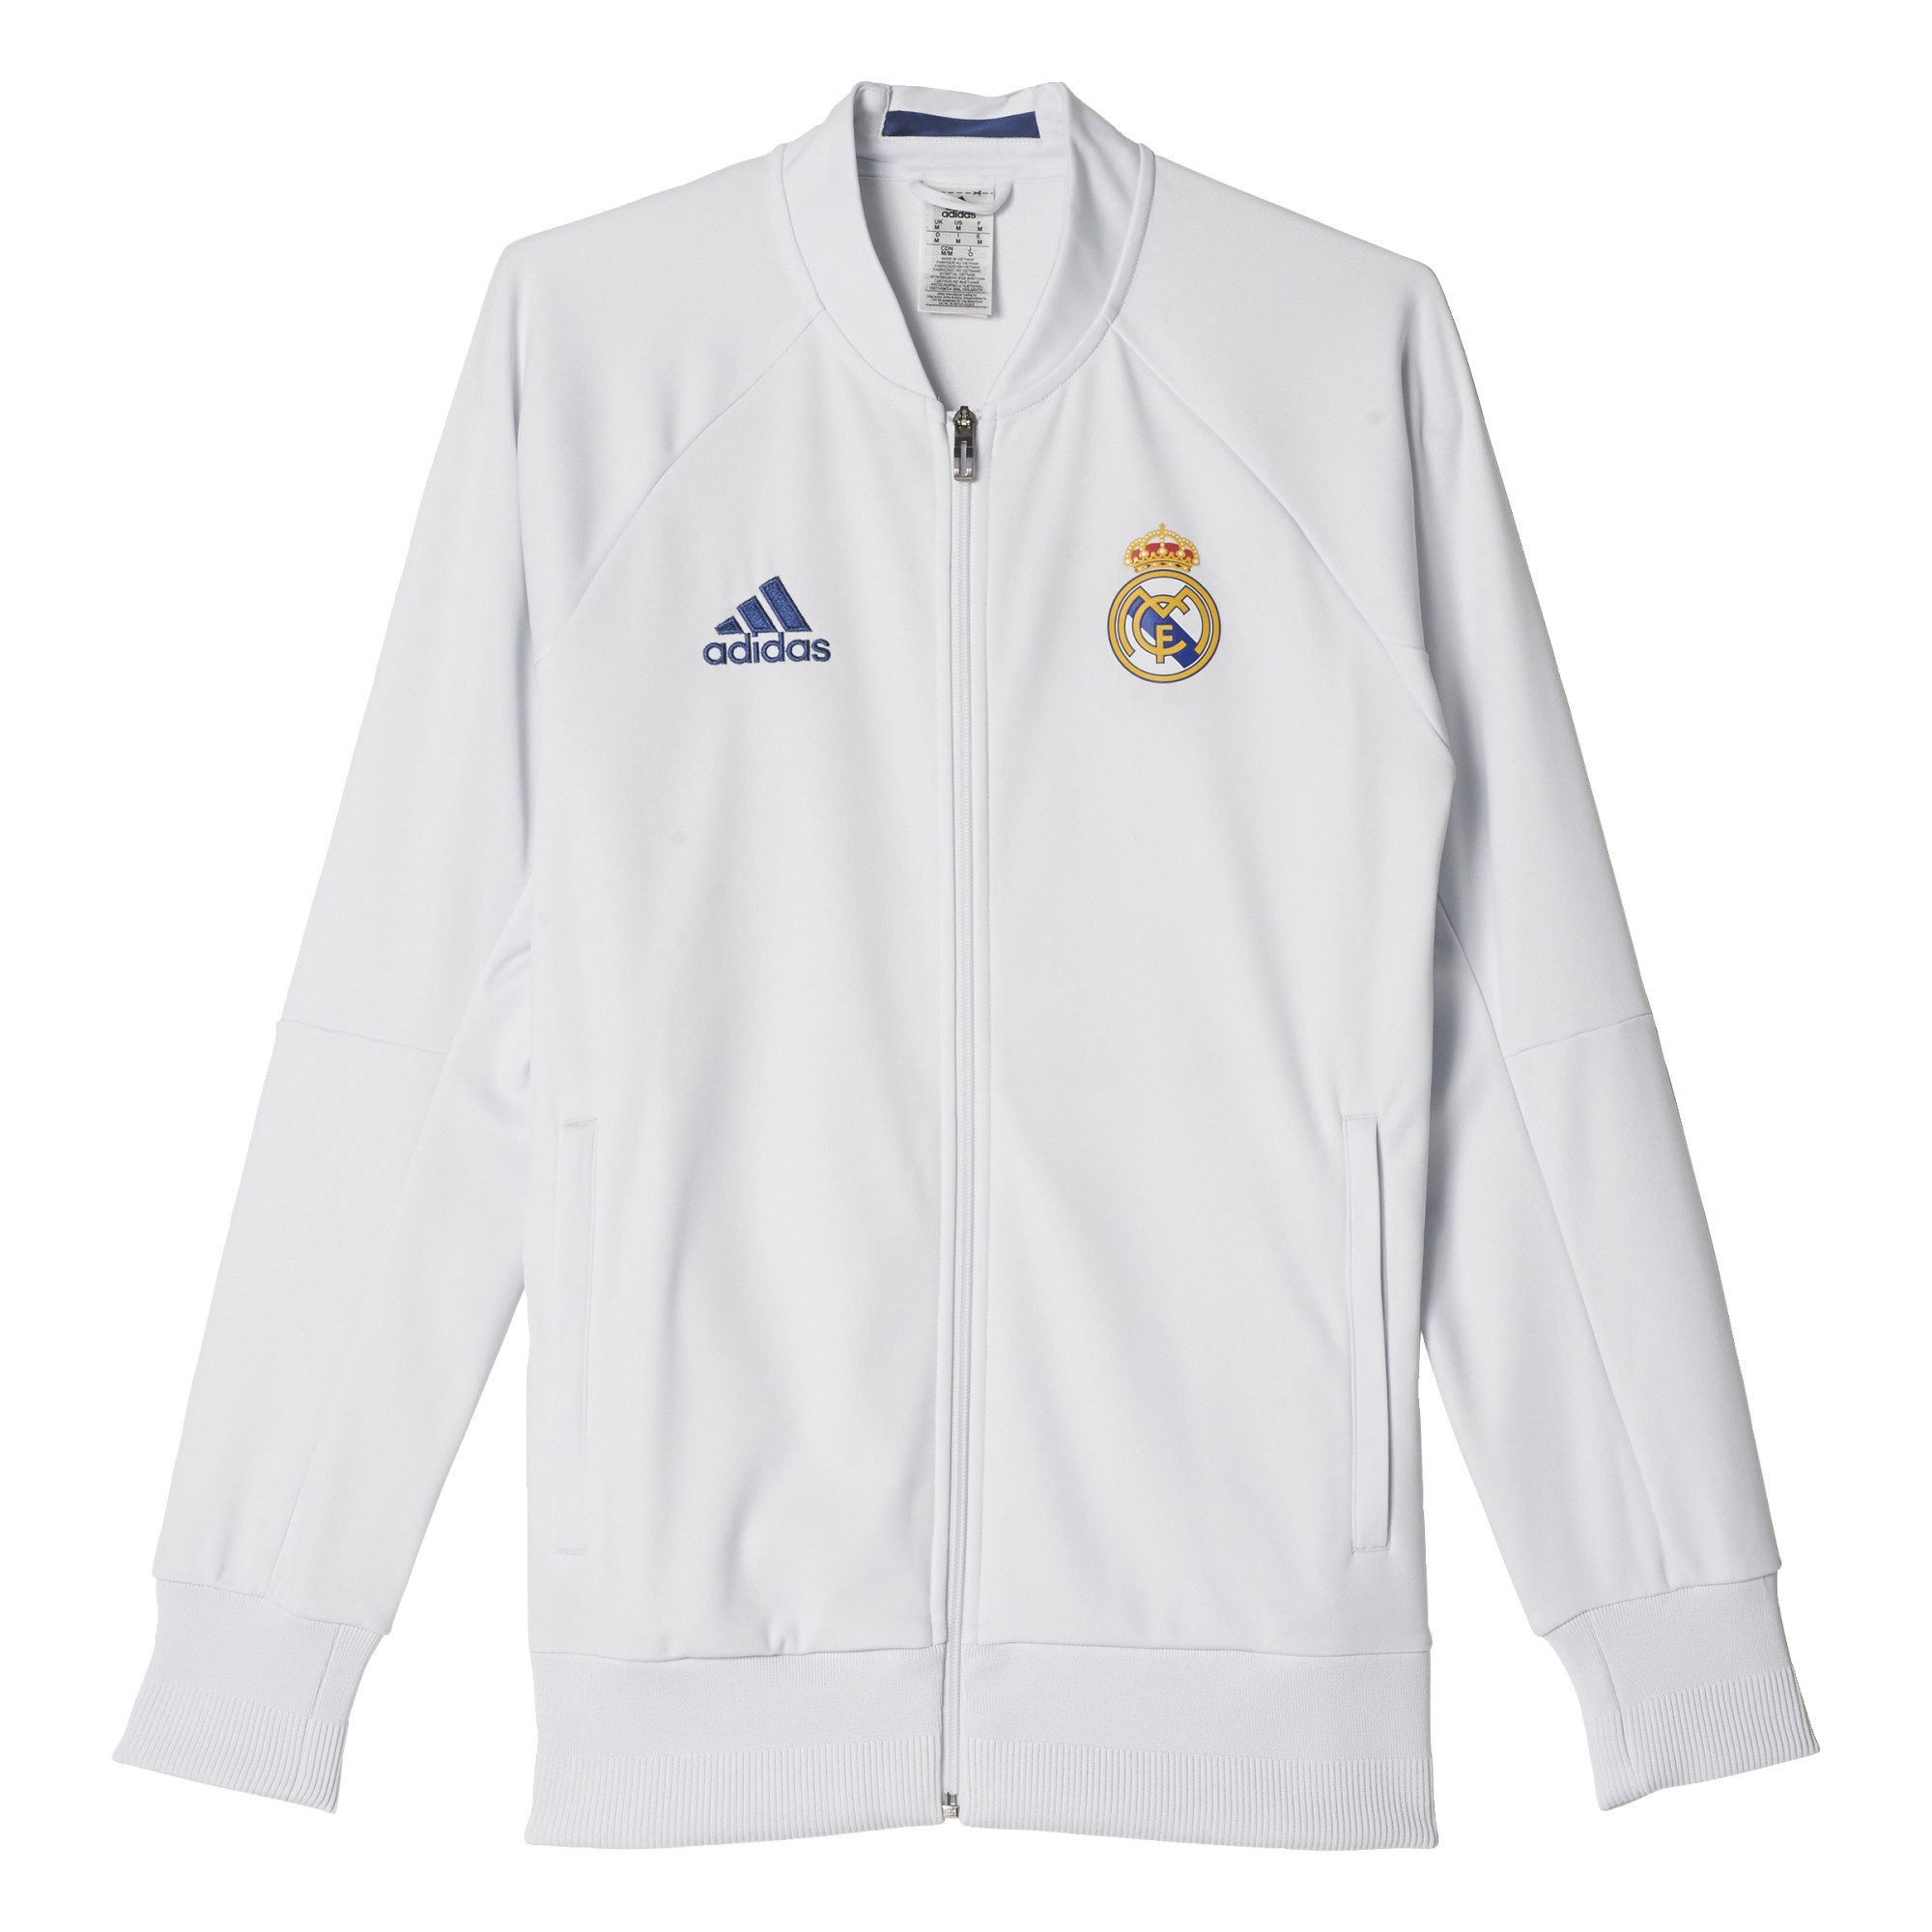 Adidas Inno Real Madrid 2016 17 Inno Adidas Giacca Calcio Merce Vera 5b9938